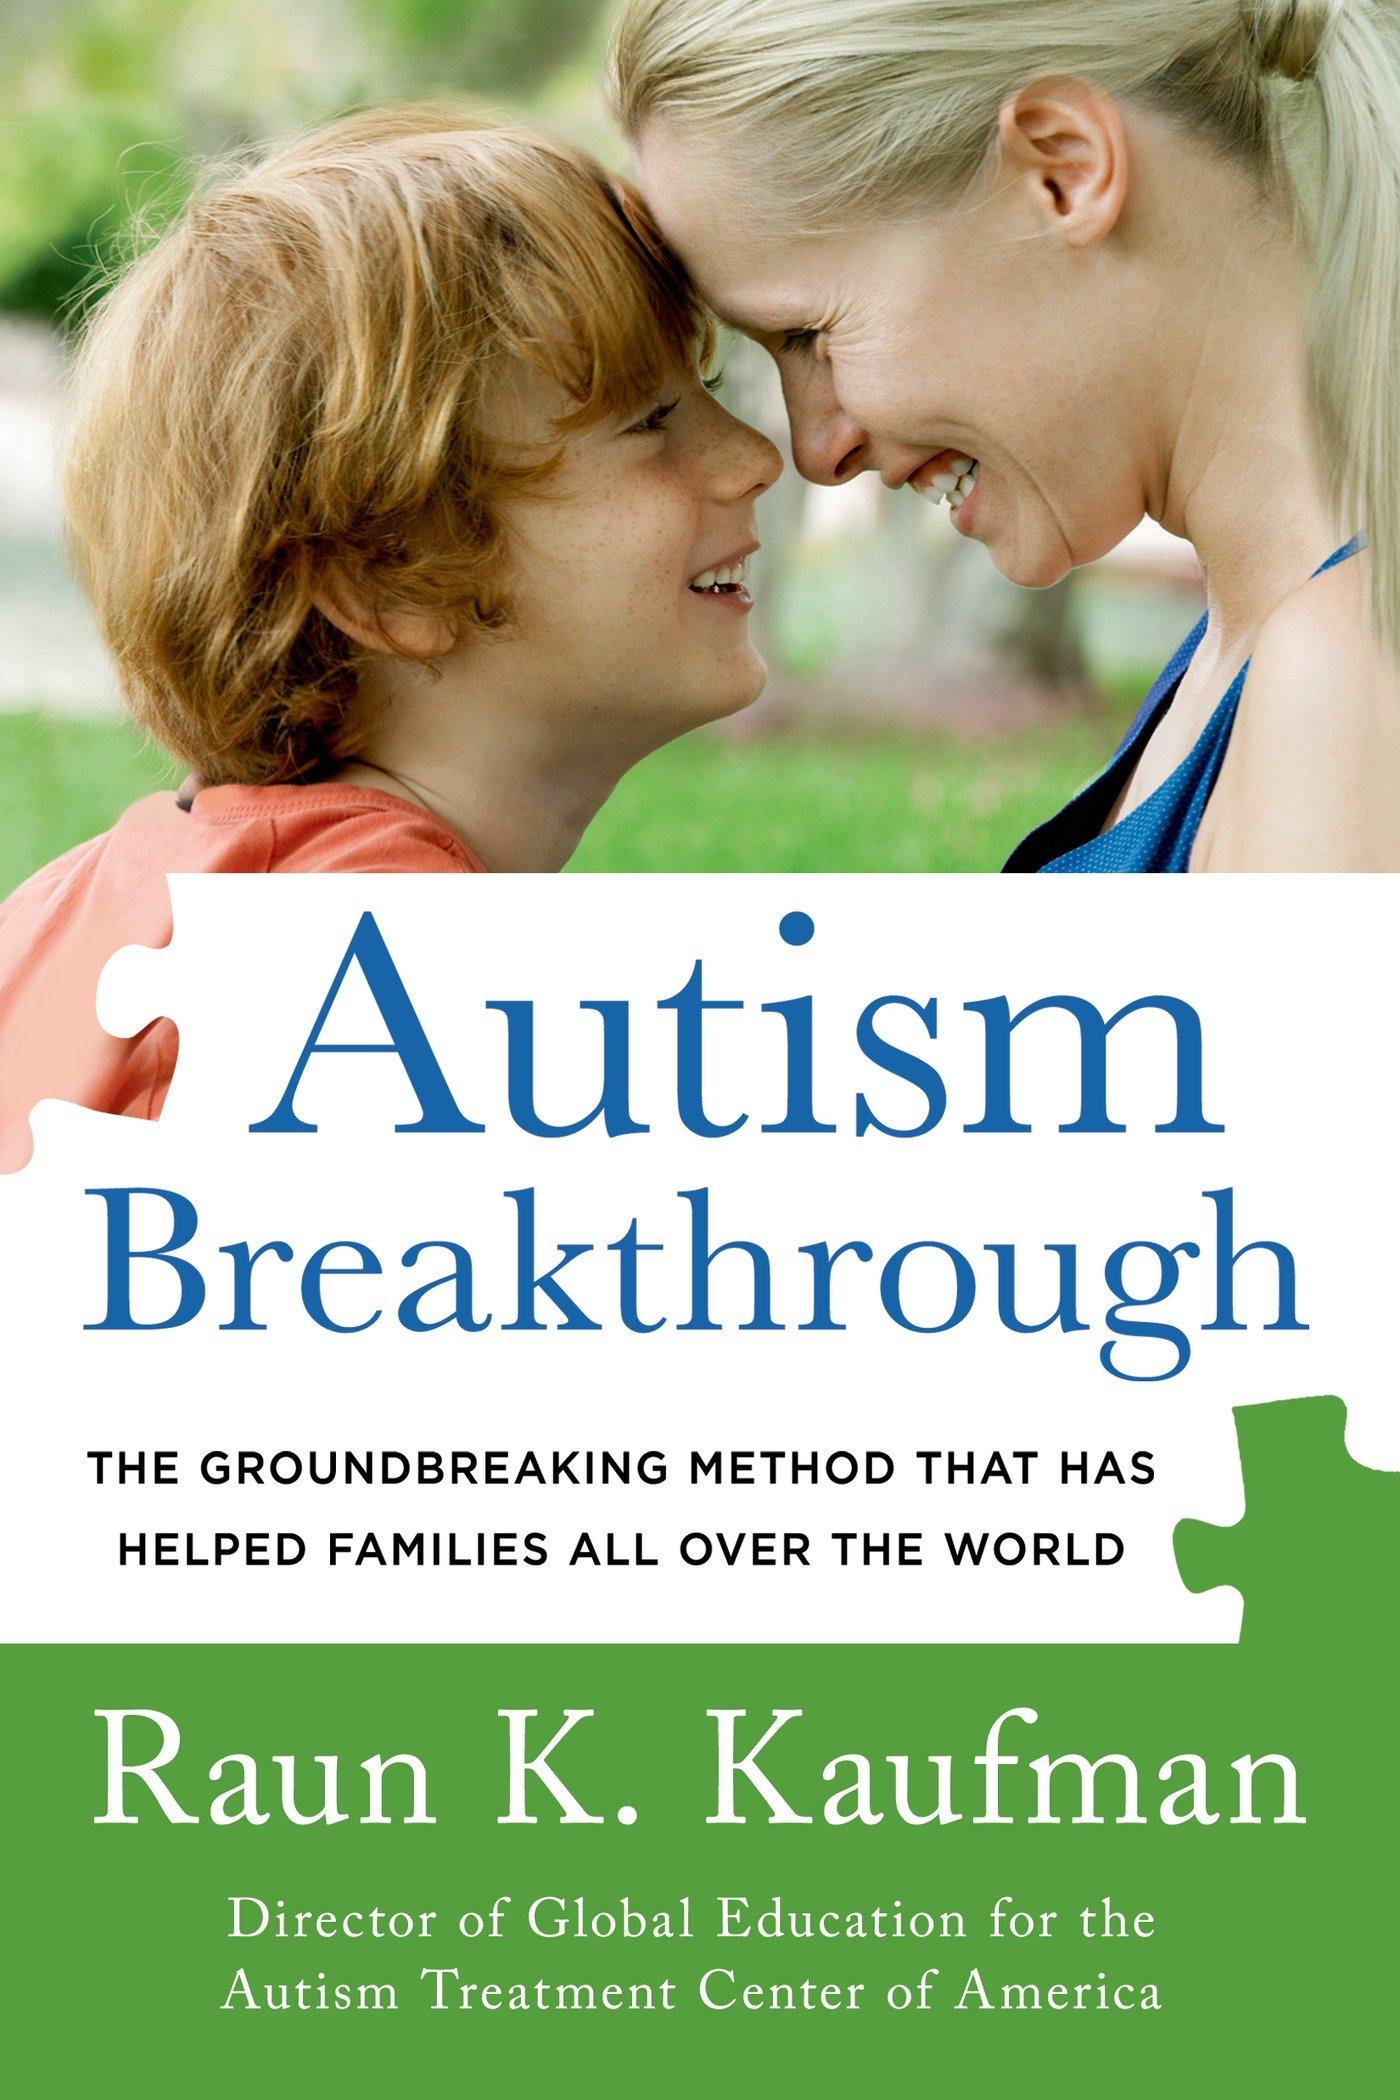 Autism Breakthrough The Groundbreaking Method That Has Helped